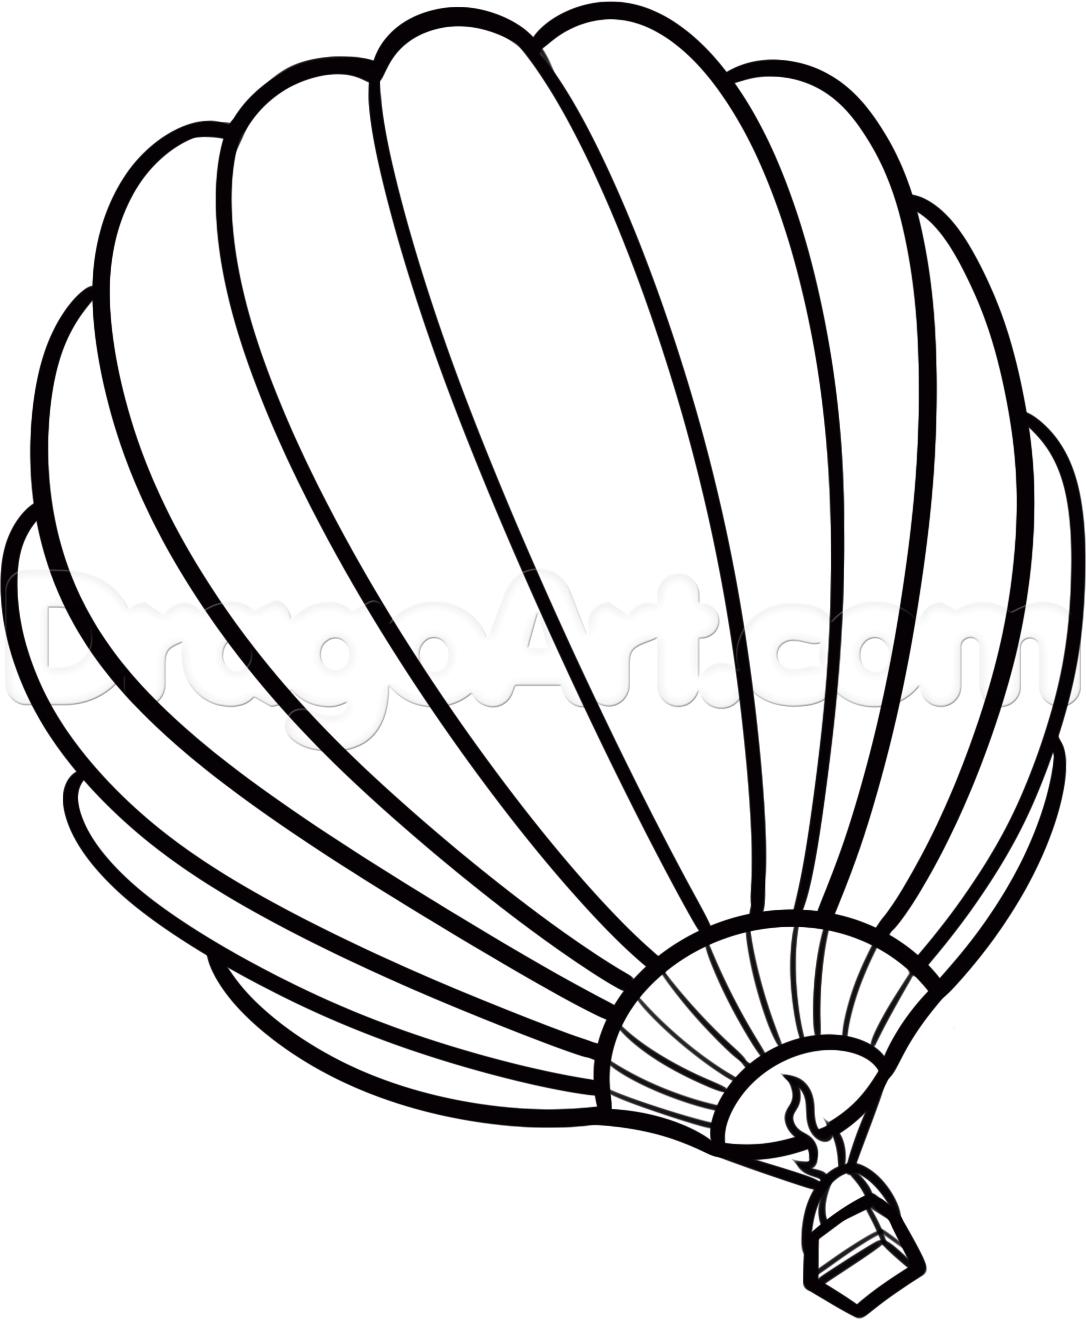 1086x1320 How To Draw A Hot Air Balloon, Step